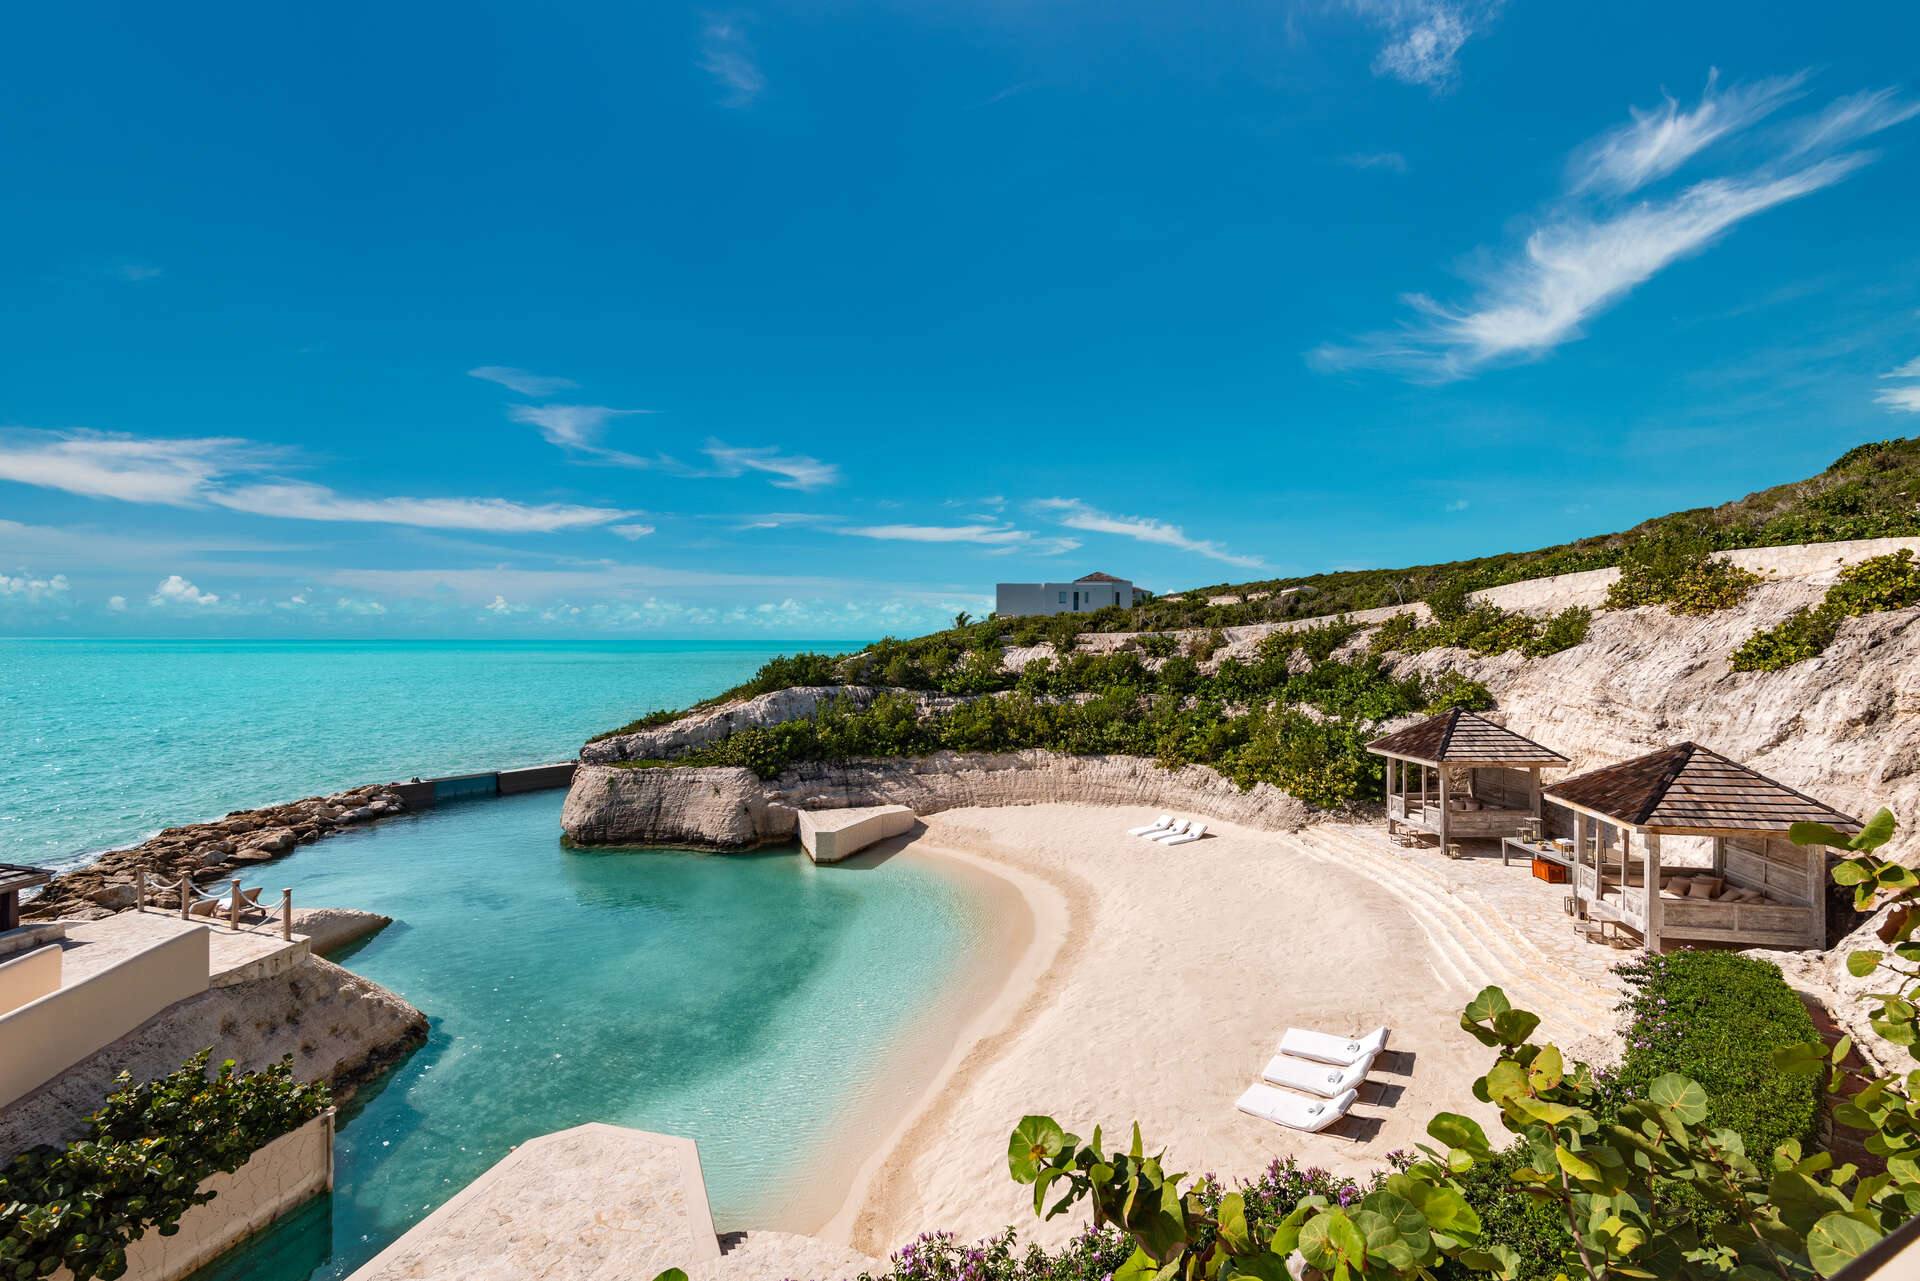 Luxury villa rentals caribbean - Turks and caicos - Providenciales - Turtle tail - Bajacu - Image 1/31